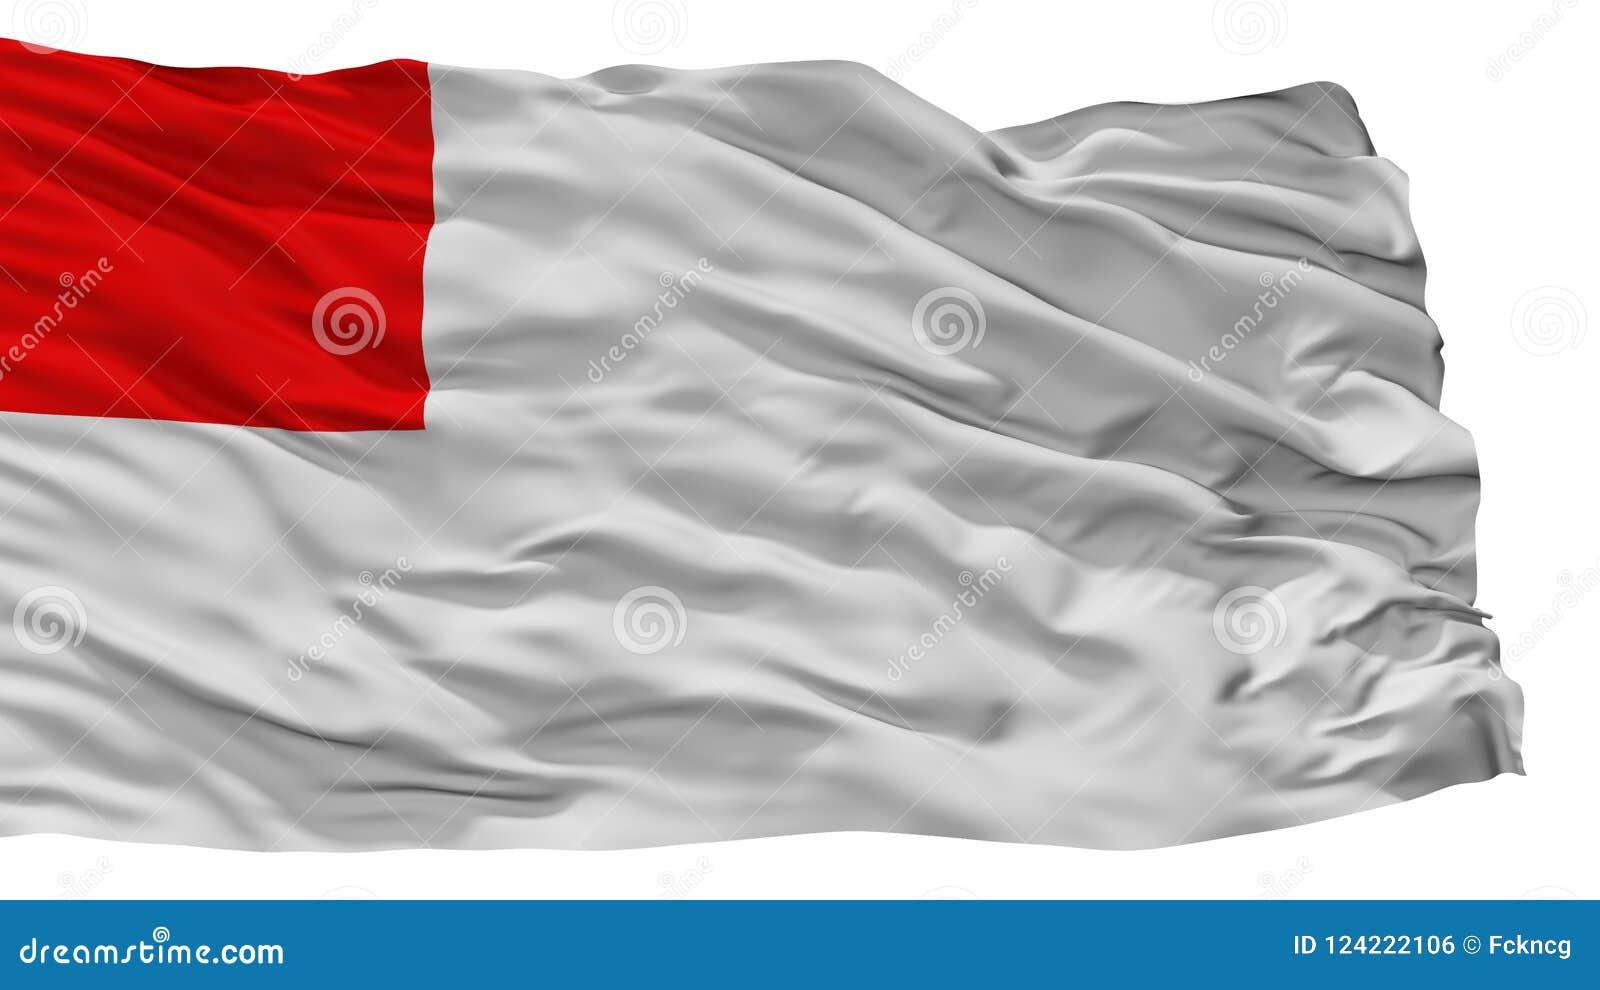 Bandeira da cidade de Bilbao, Espanha, isolada no fundo branco